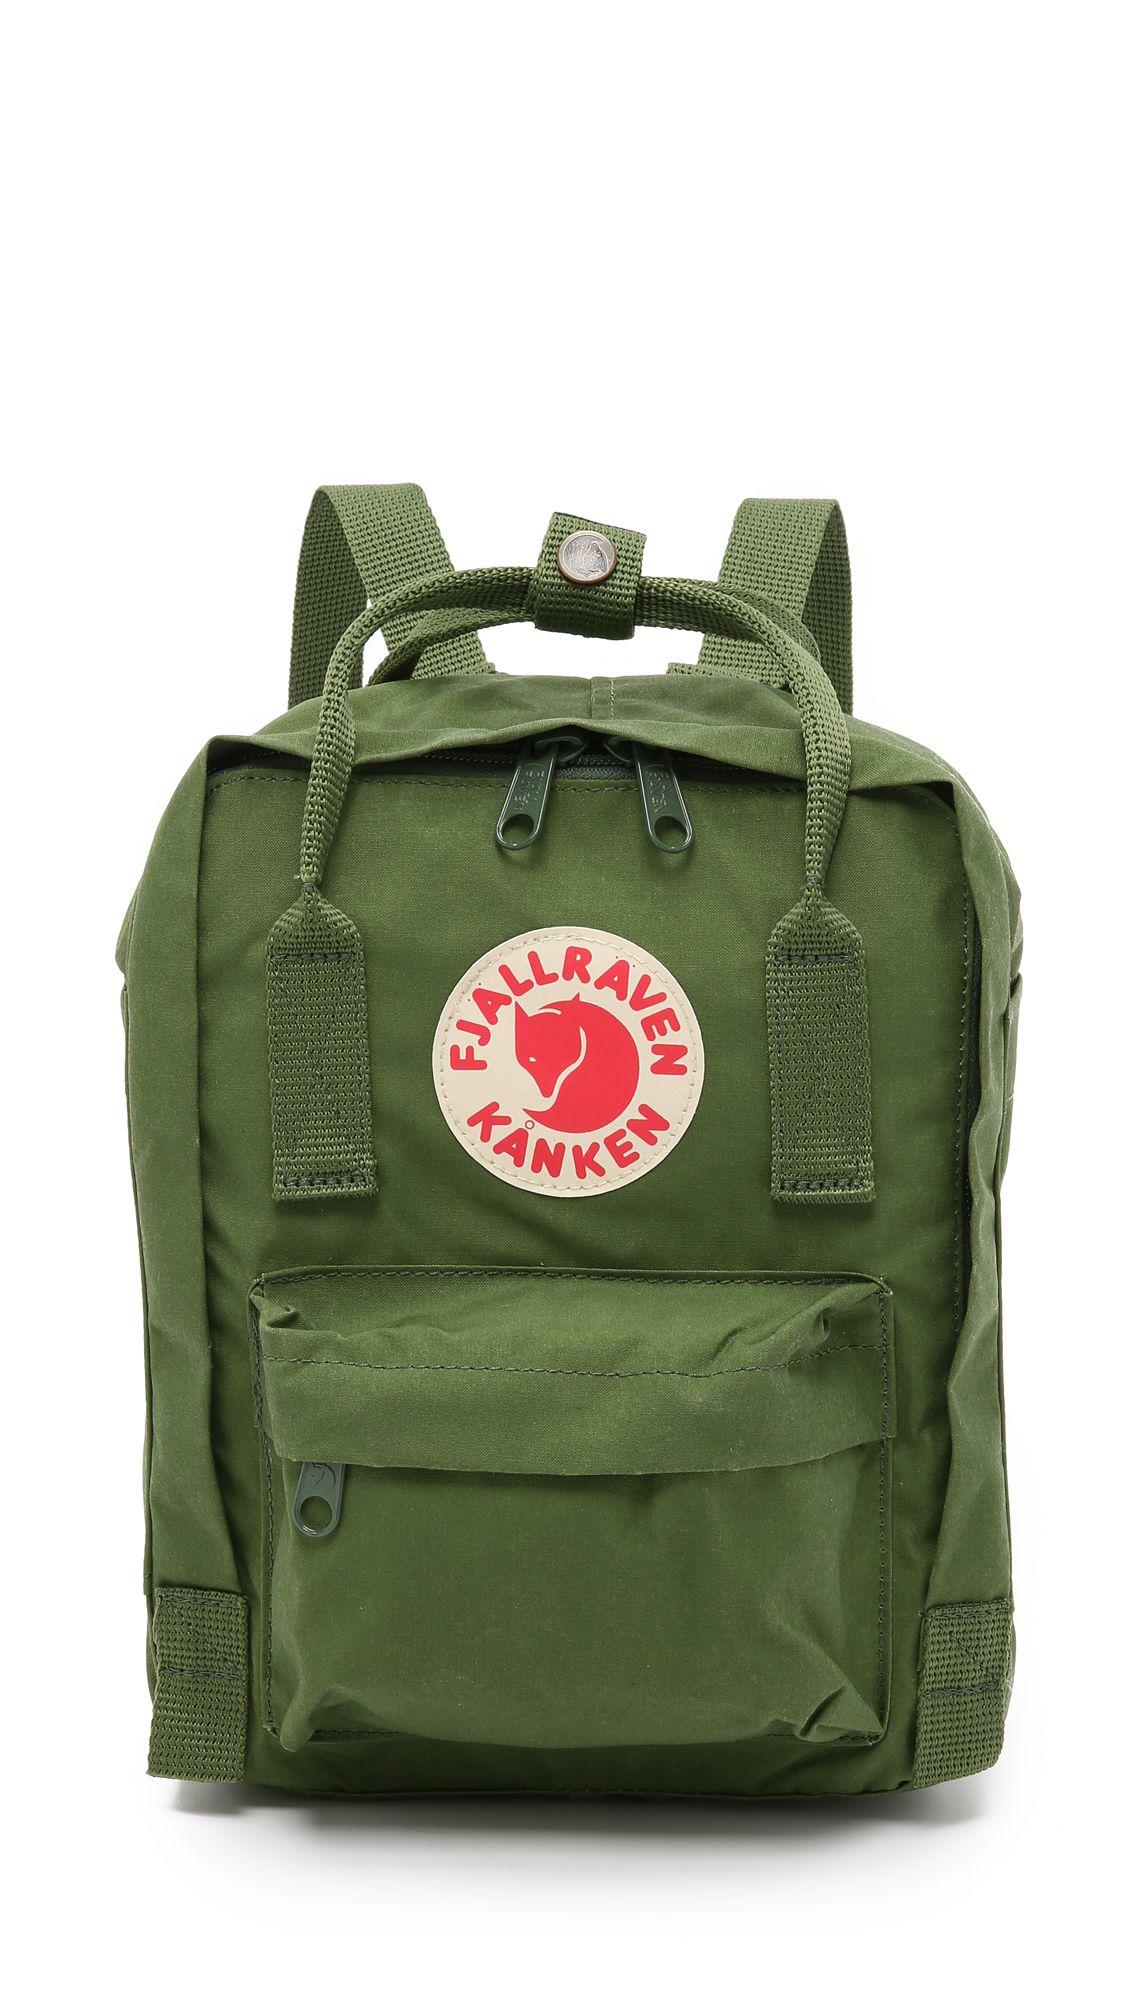 Fjallraven Kanken Mini Backpack - Leaf Green  0125ad8e39da0